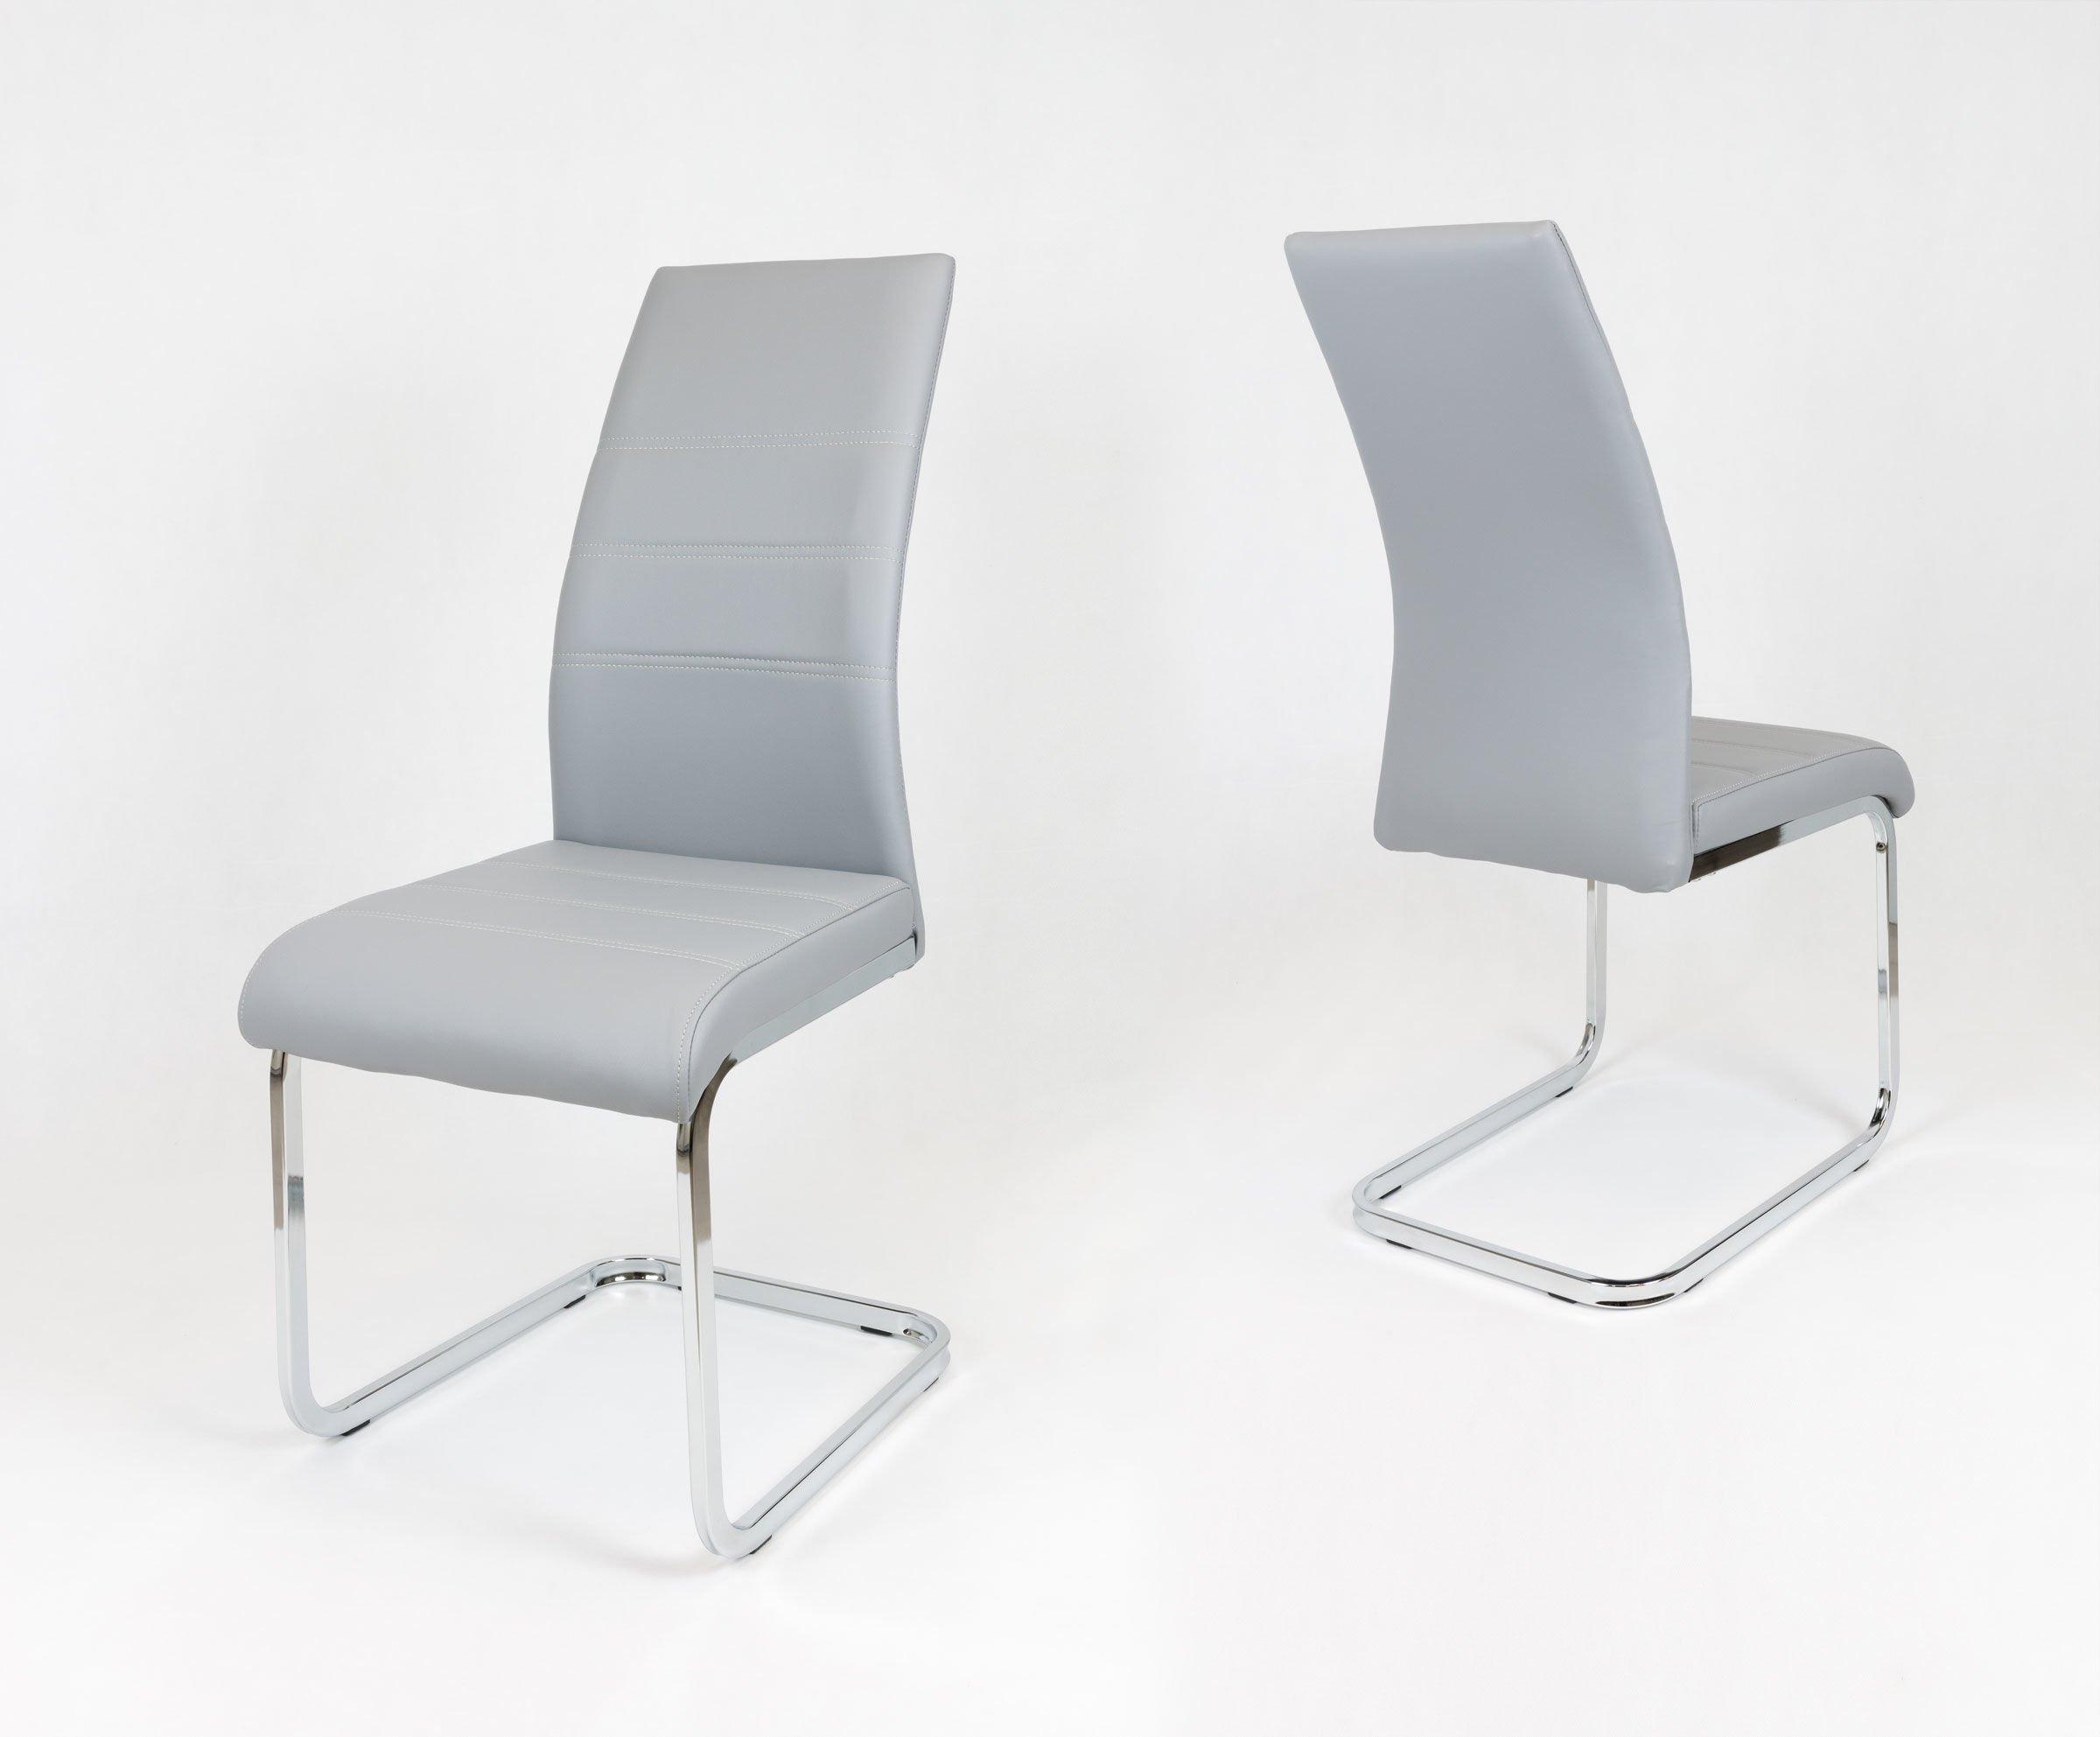 Sk design ks031 grau kunsleder stuhl mit chromgestell grau for Design stuhl grau